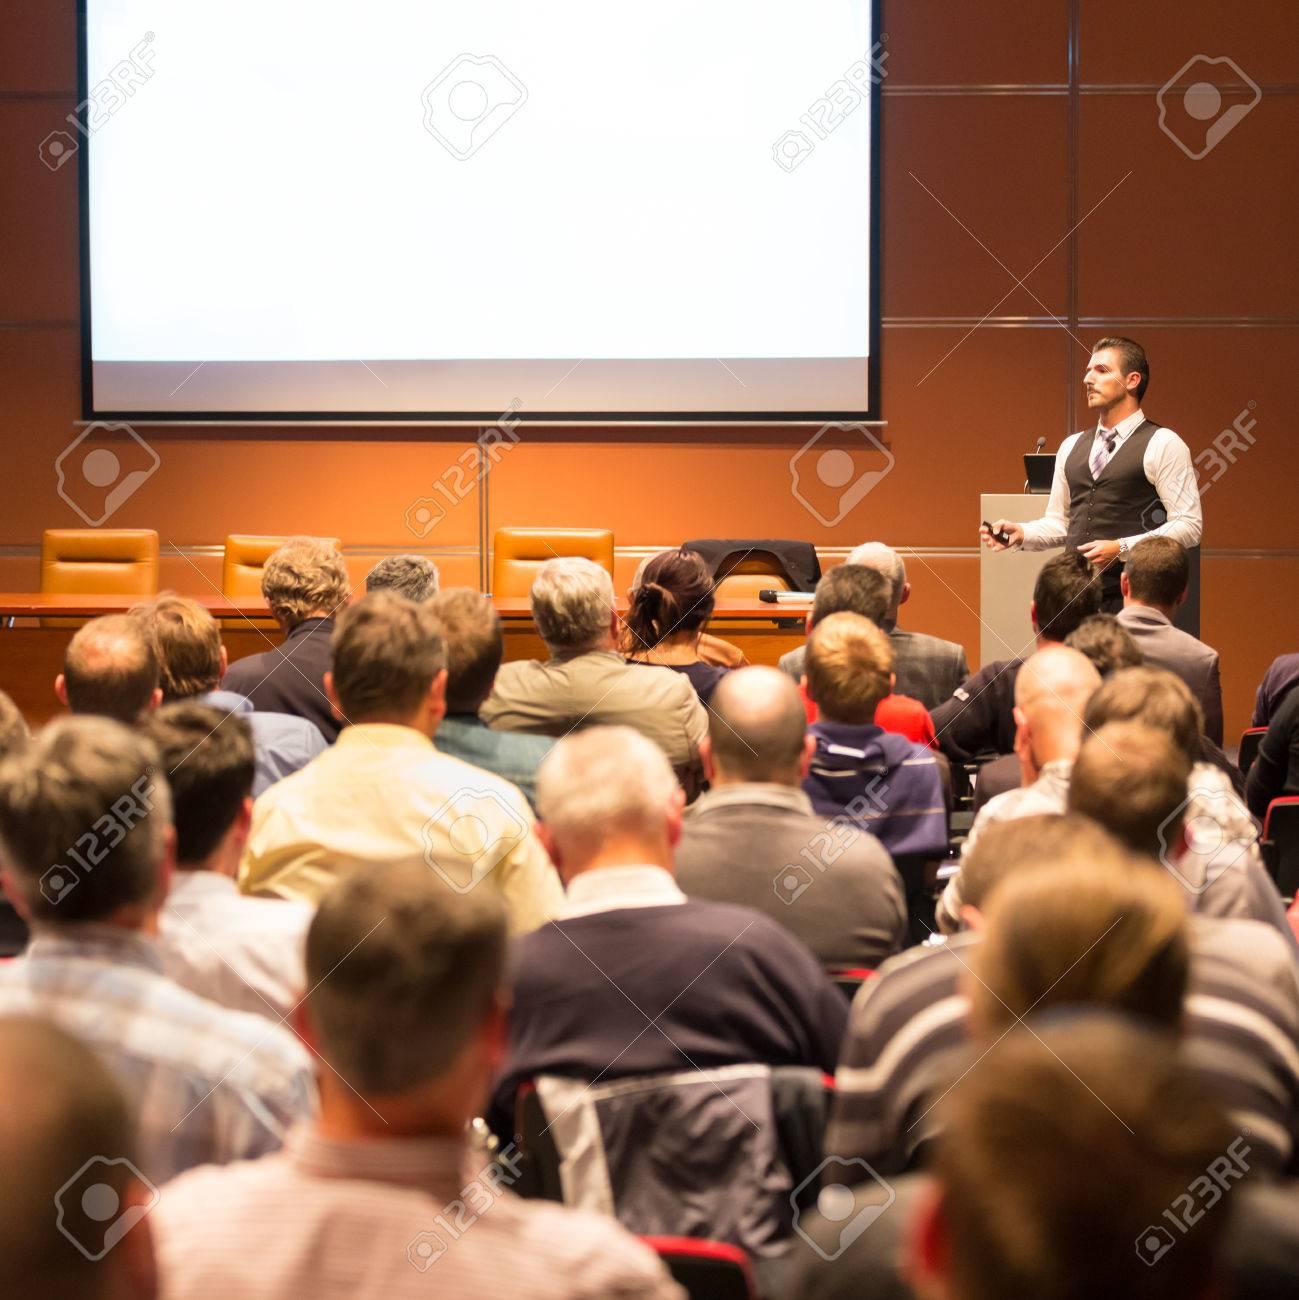 Speaker at Business Conference and Presentation. Audience at the conference hall. Business and Entrepreneurship. Standard-Bild - 53608038